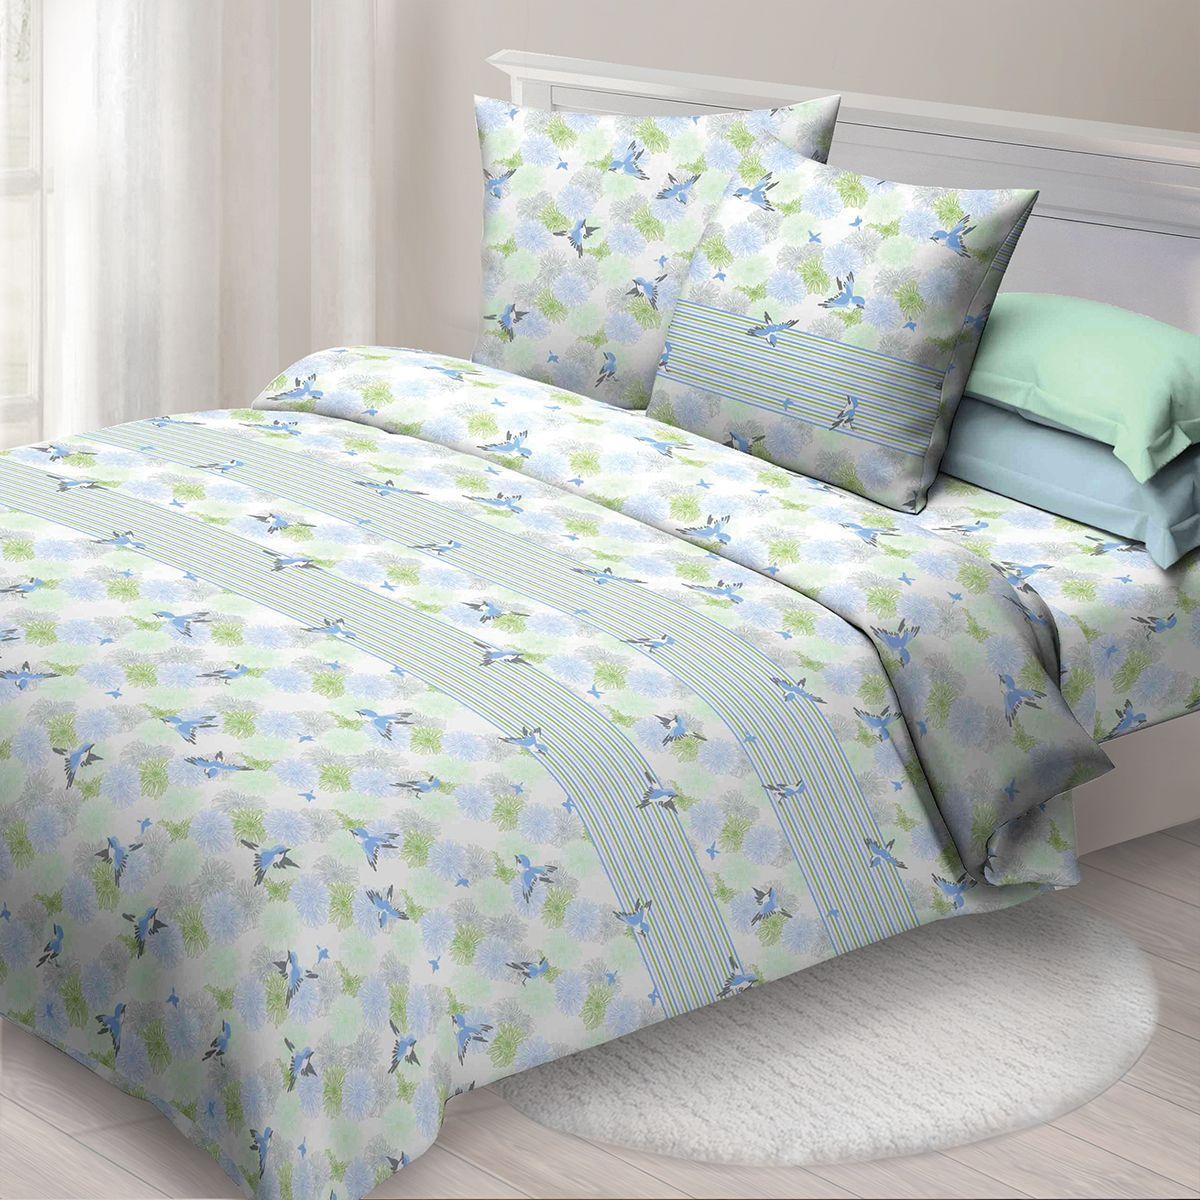 Комплект белья Спал Спалыч Ариана, евро, наволочки 70x70, цвет: голубой. 4085-284201